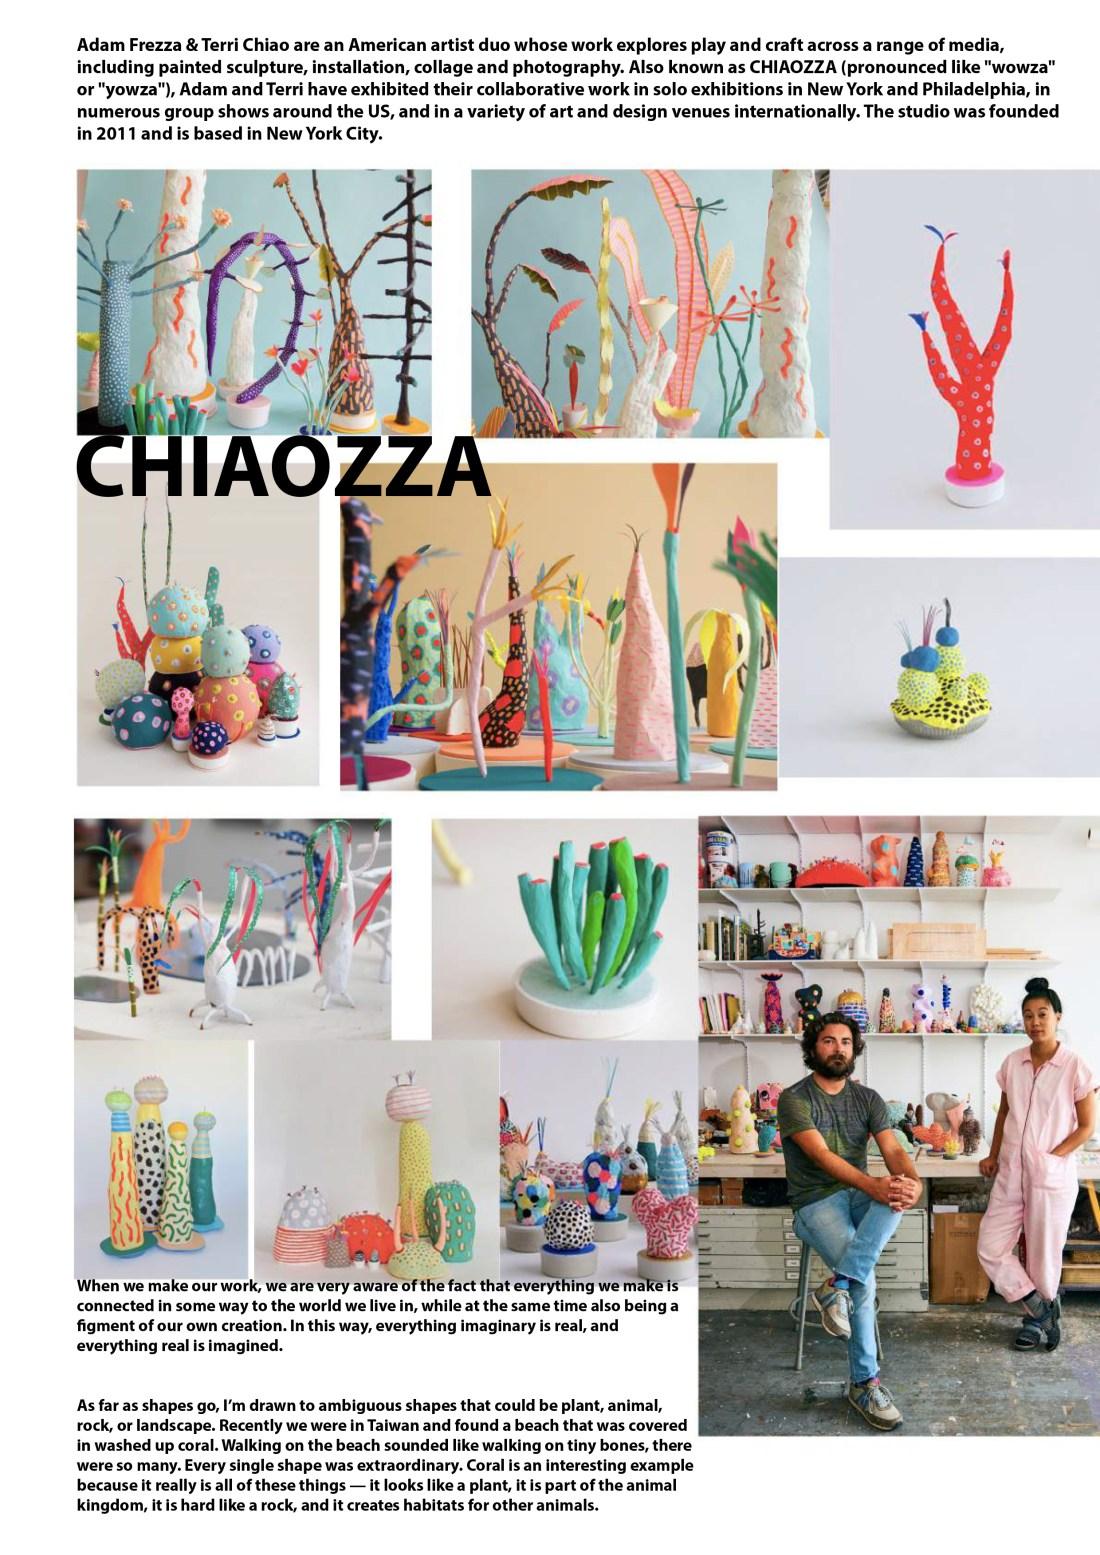 Chiaozza